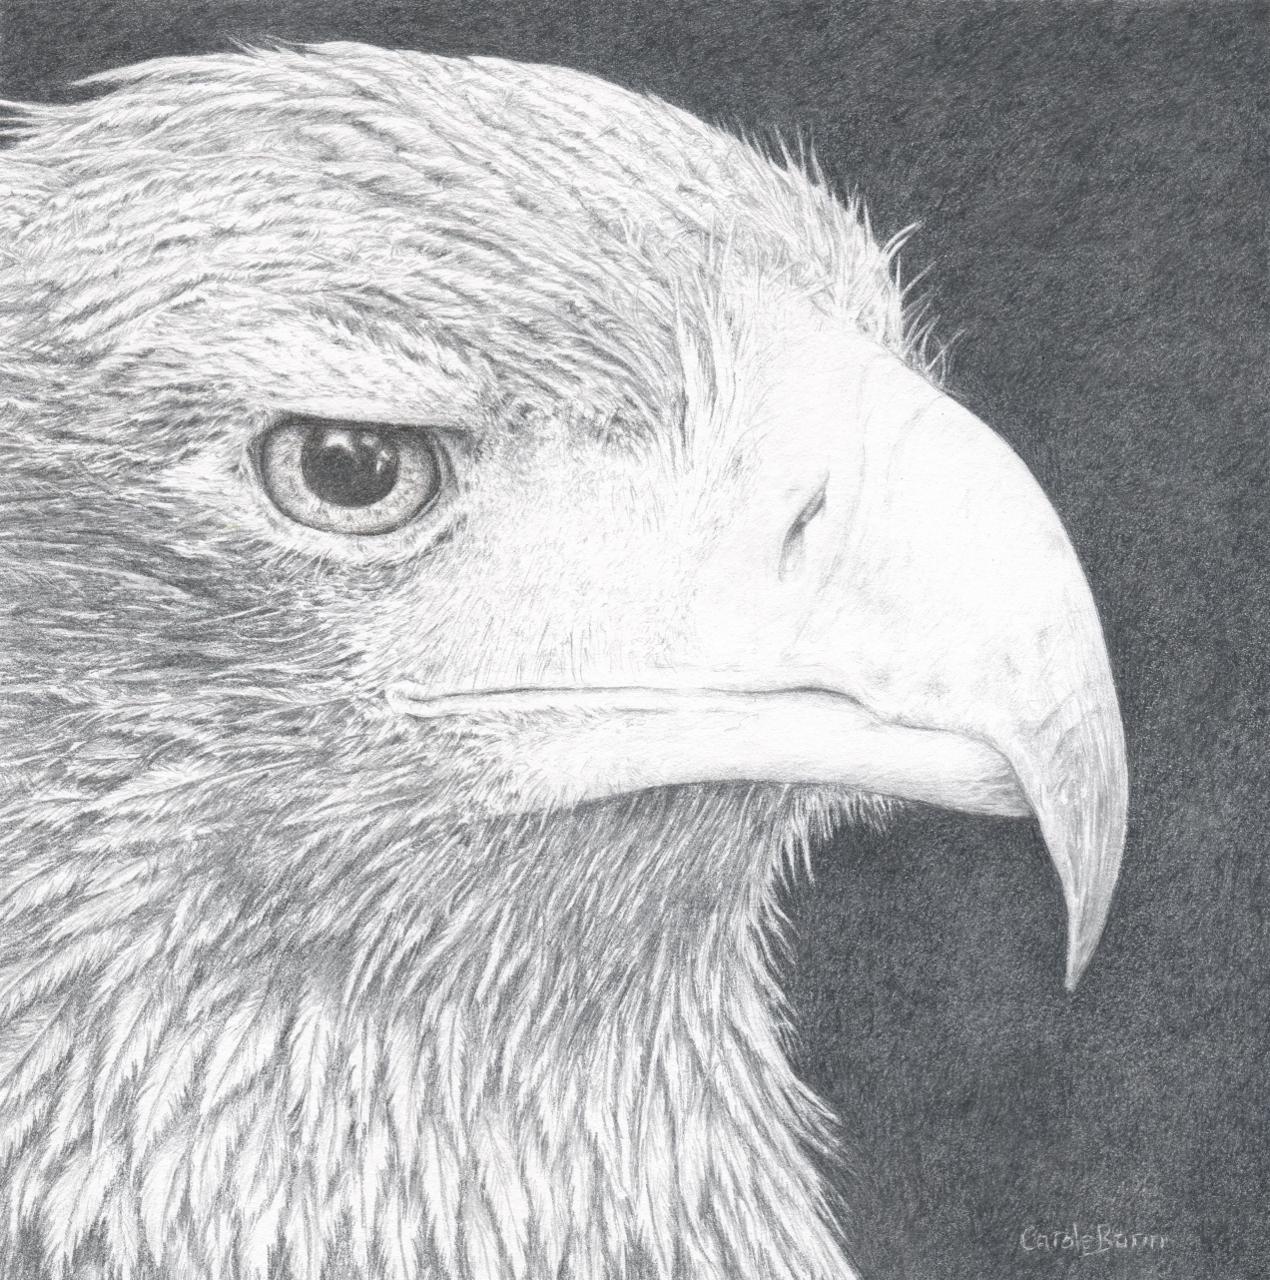 Carole Bann, Eagle, 2015, 24ct gold and silver, 20.5x38cm.jpg